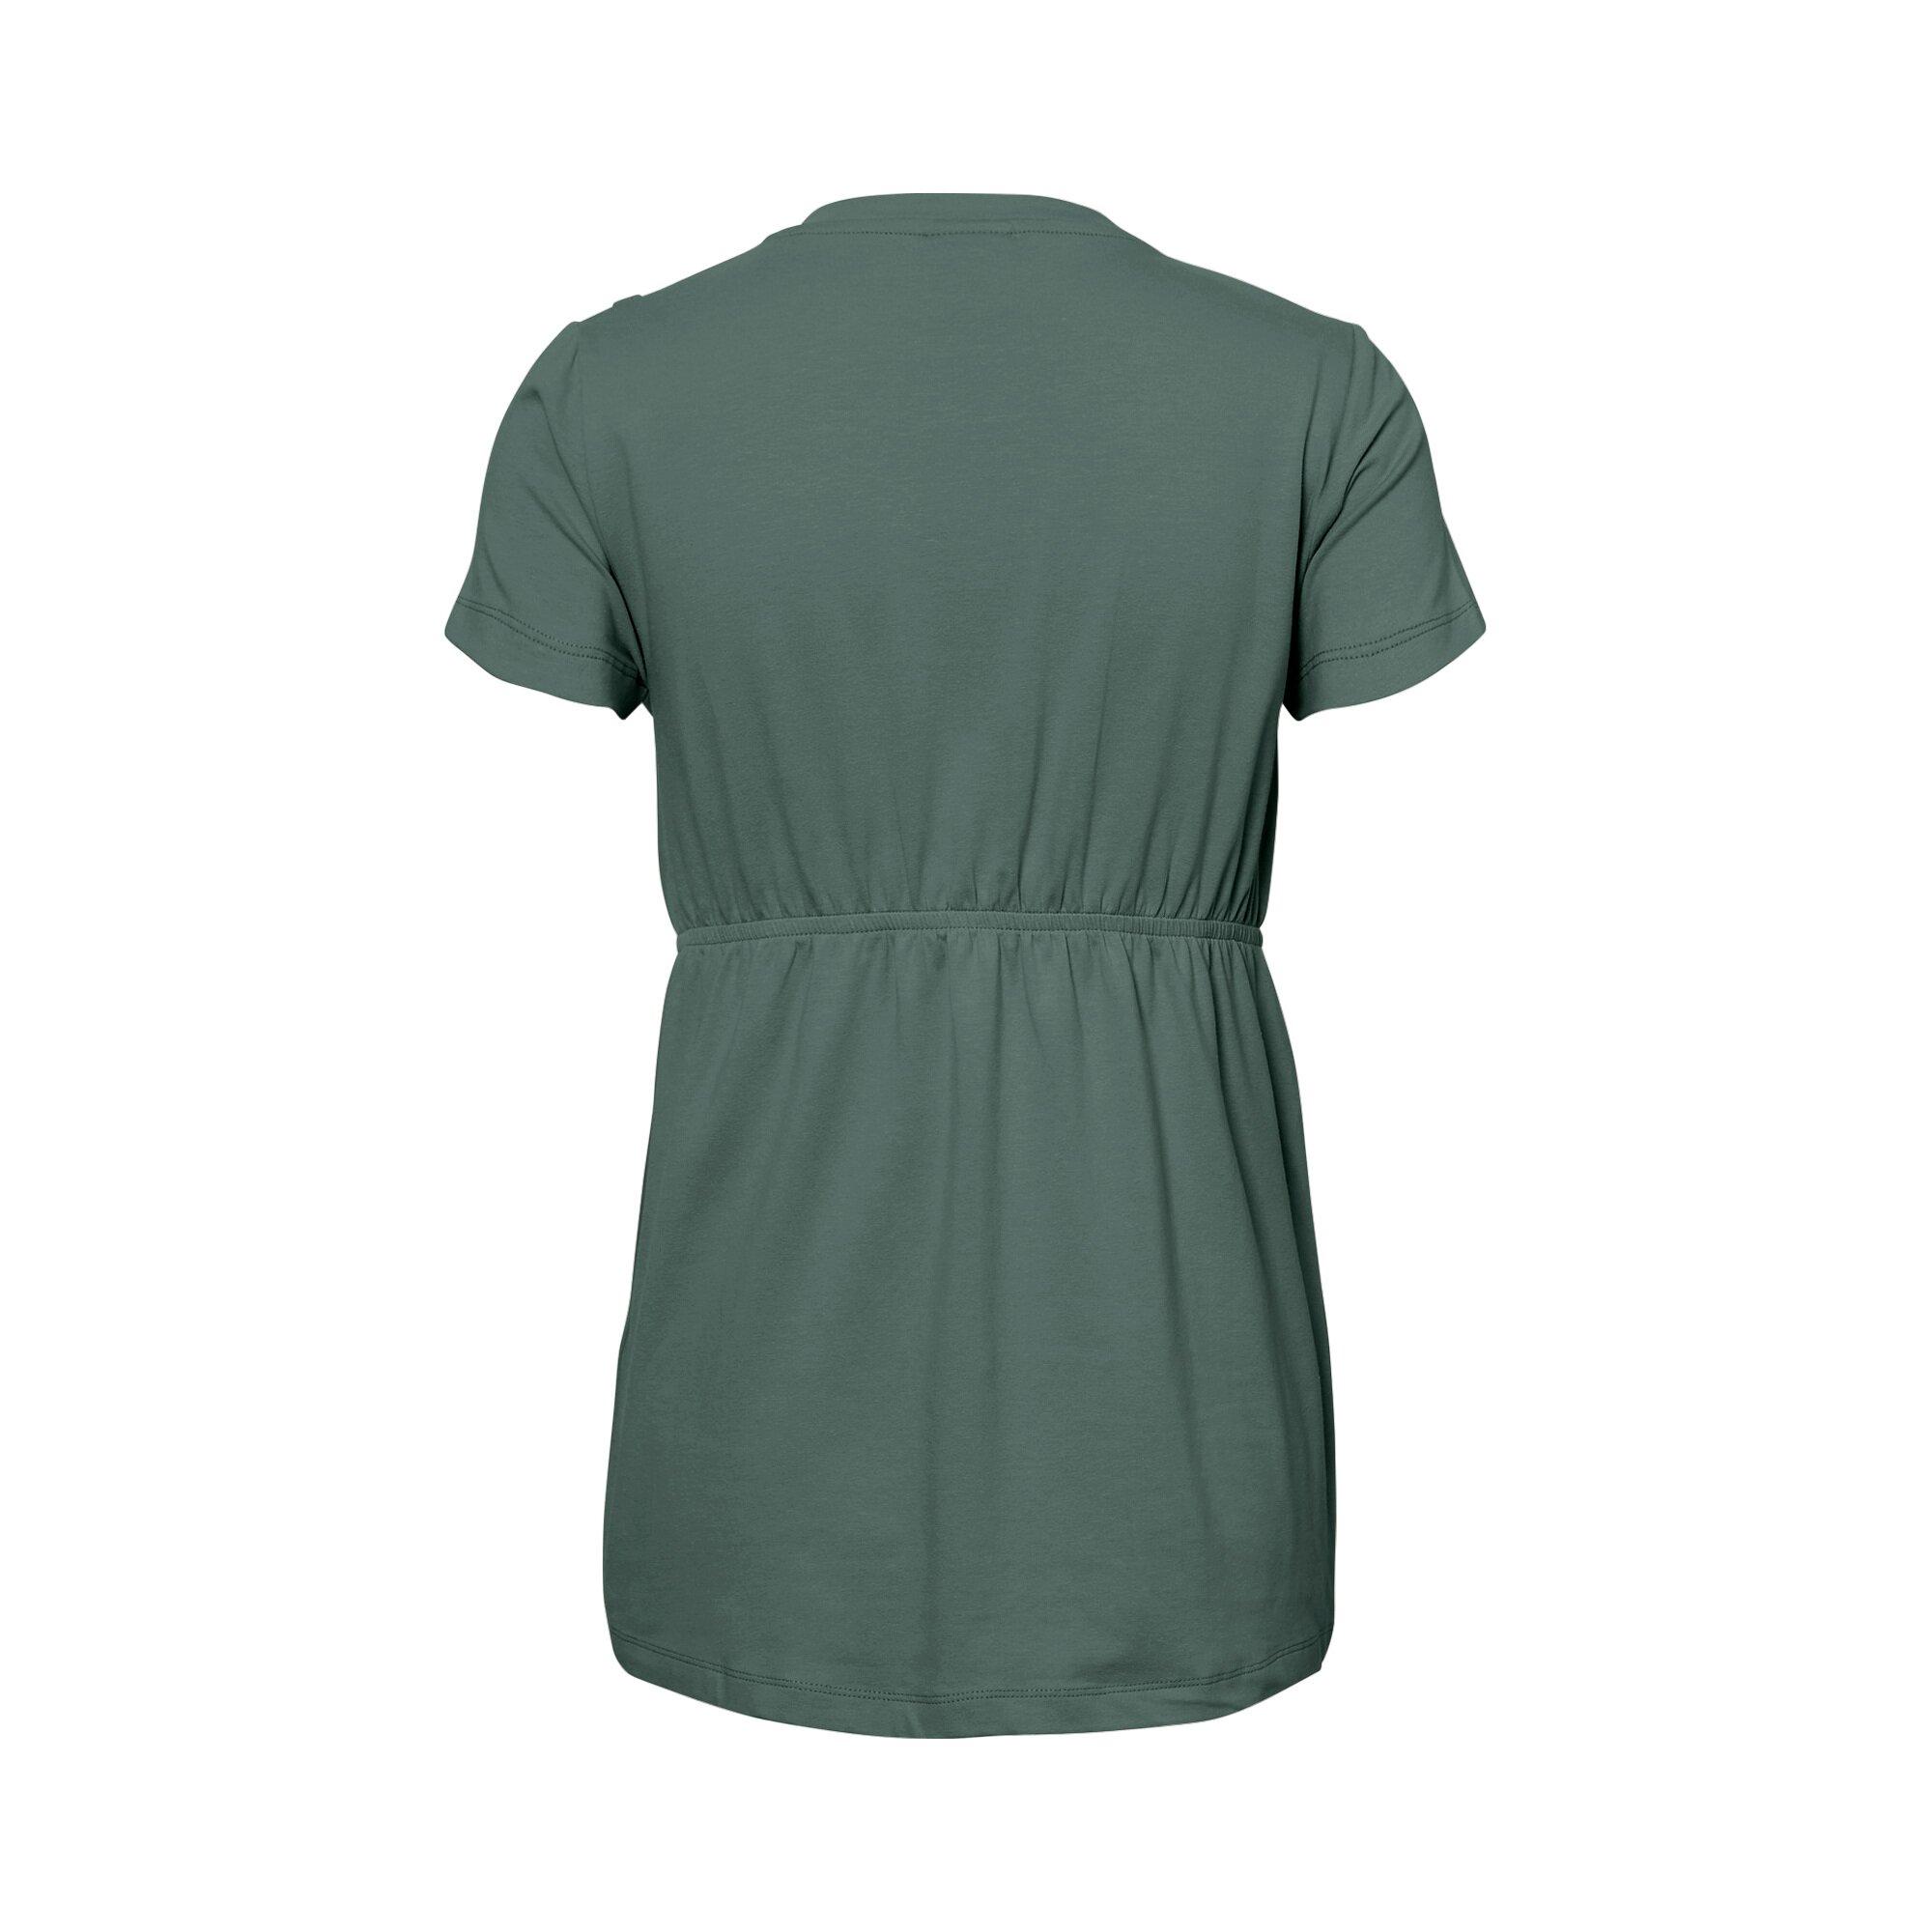 mamalicious-umstands-und-still-t-shirt-riley-organic-cotton